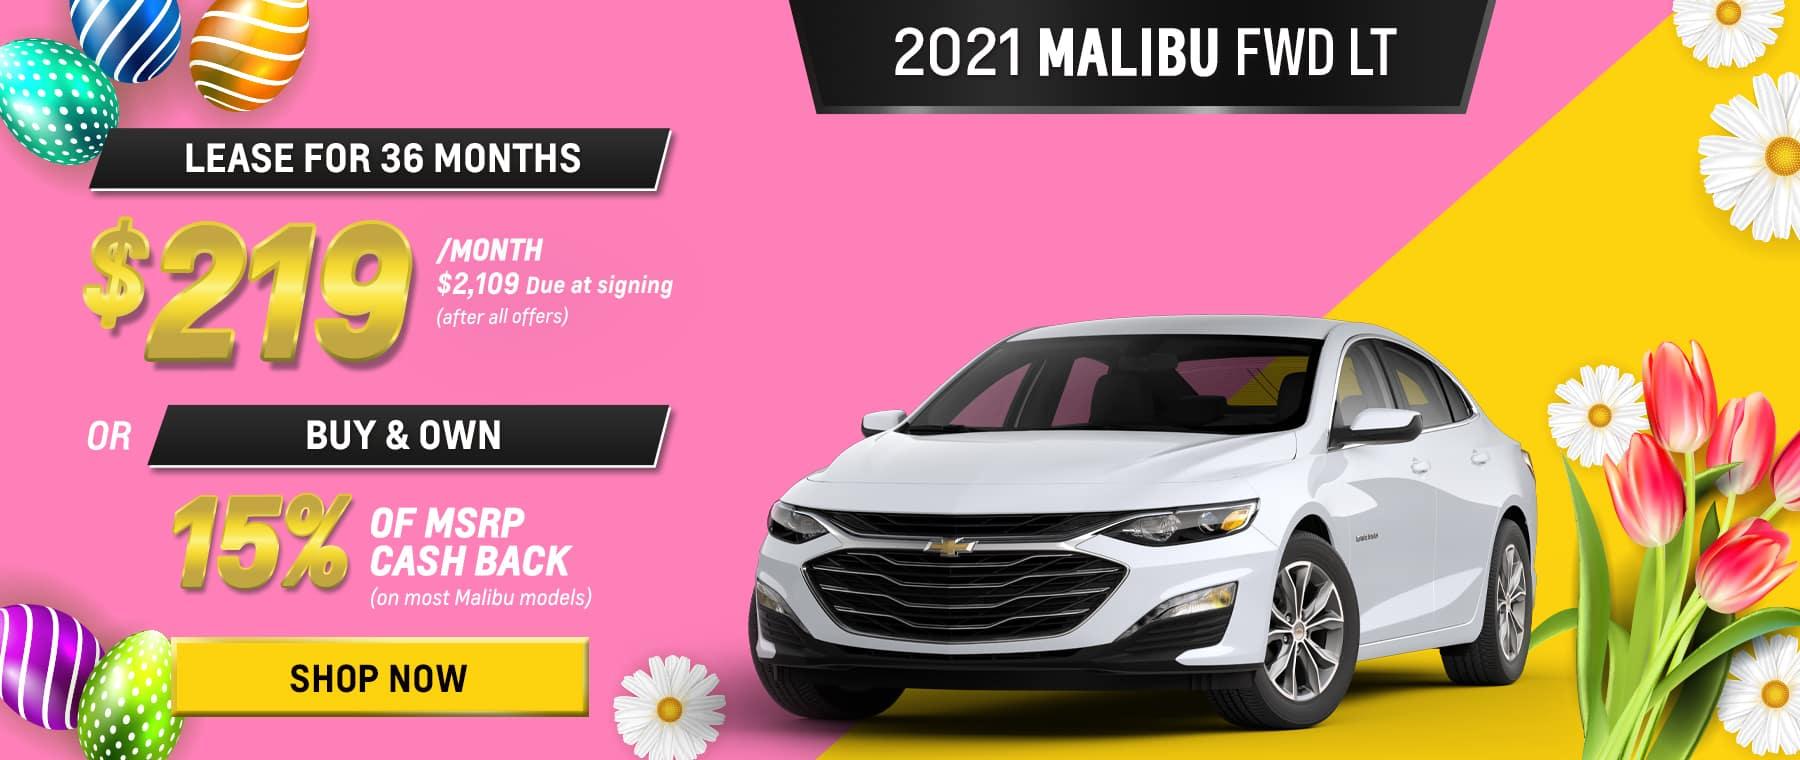 Malibu-0421